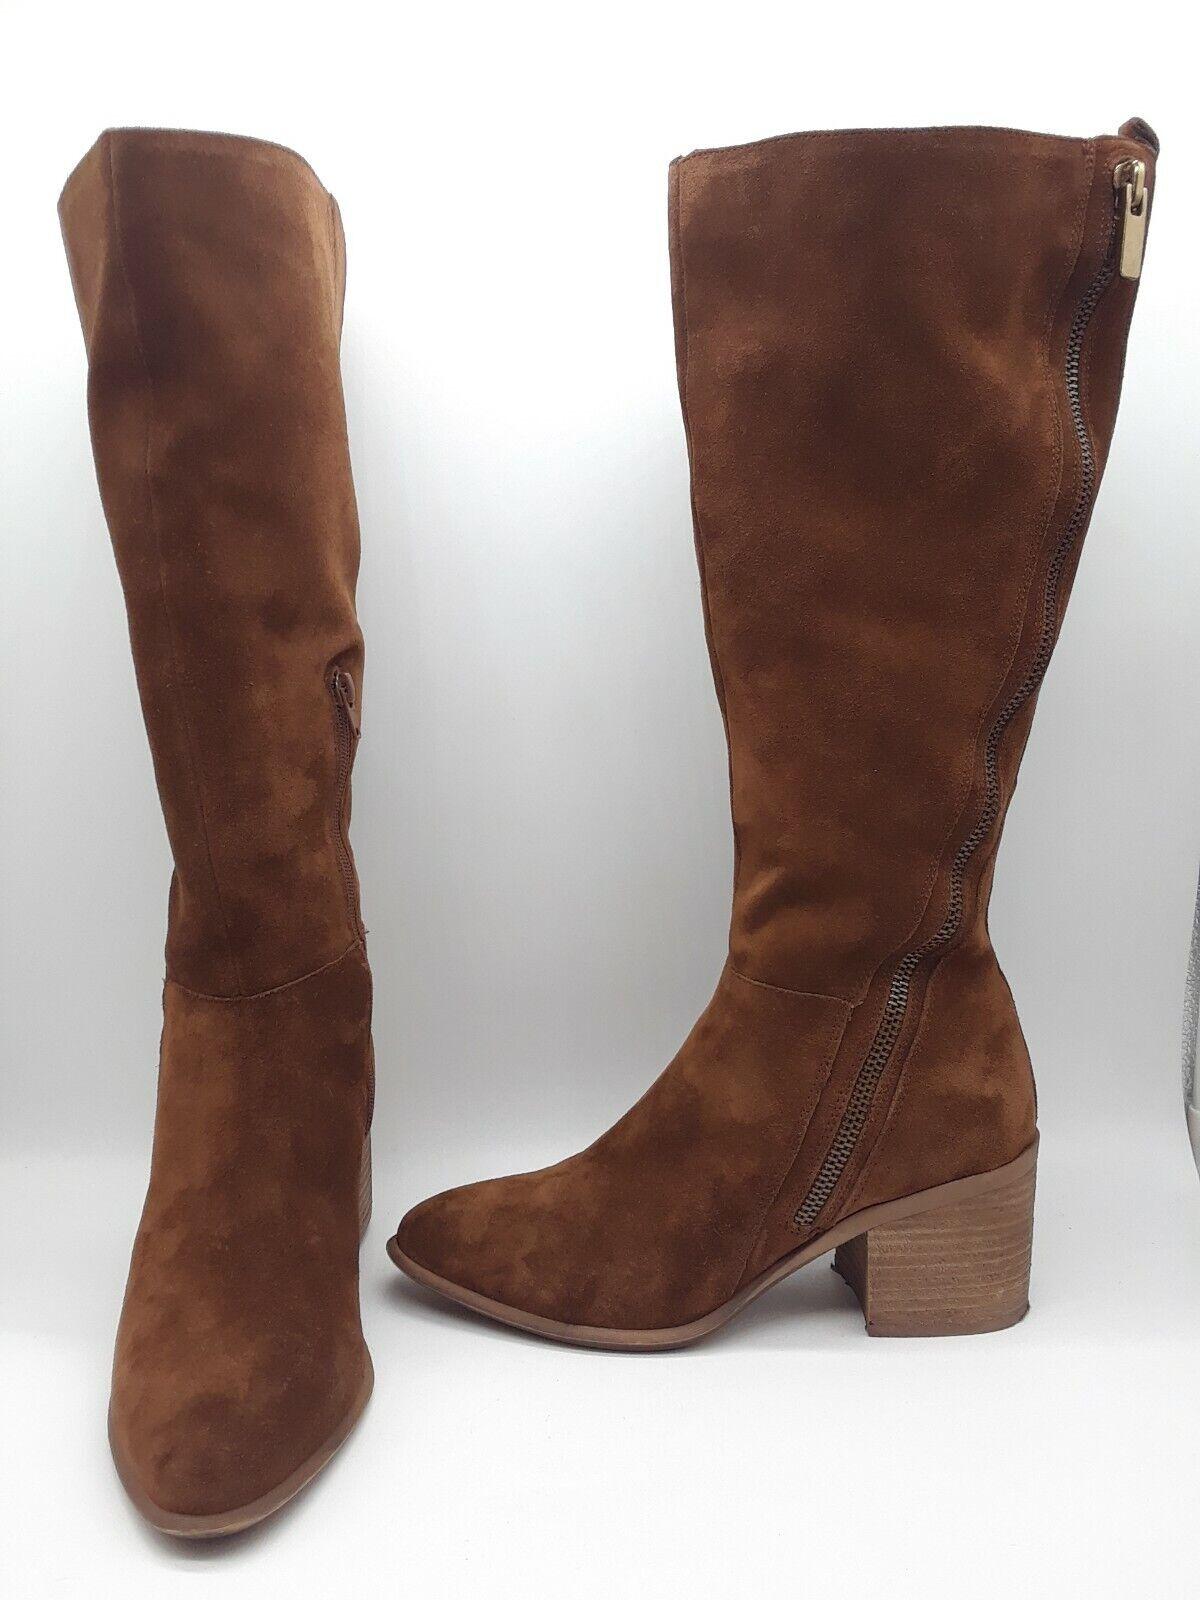 Carlos by Carlos Santana Ashbury Women shoes Riding Boots Mustang Sz 9.5 M